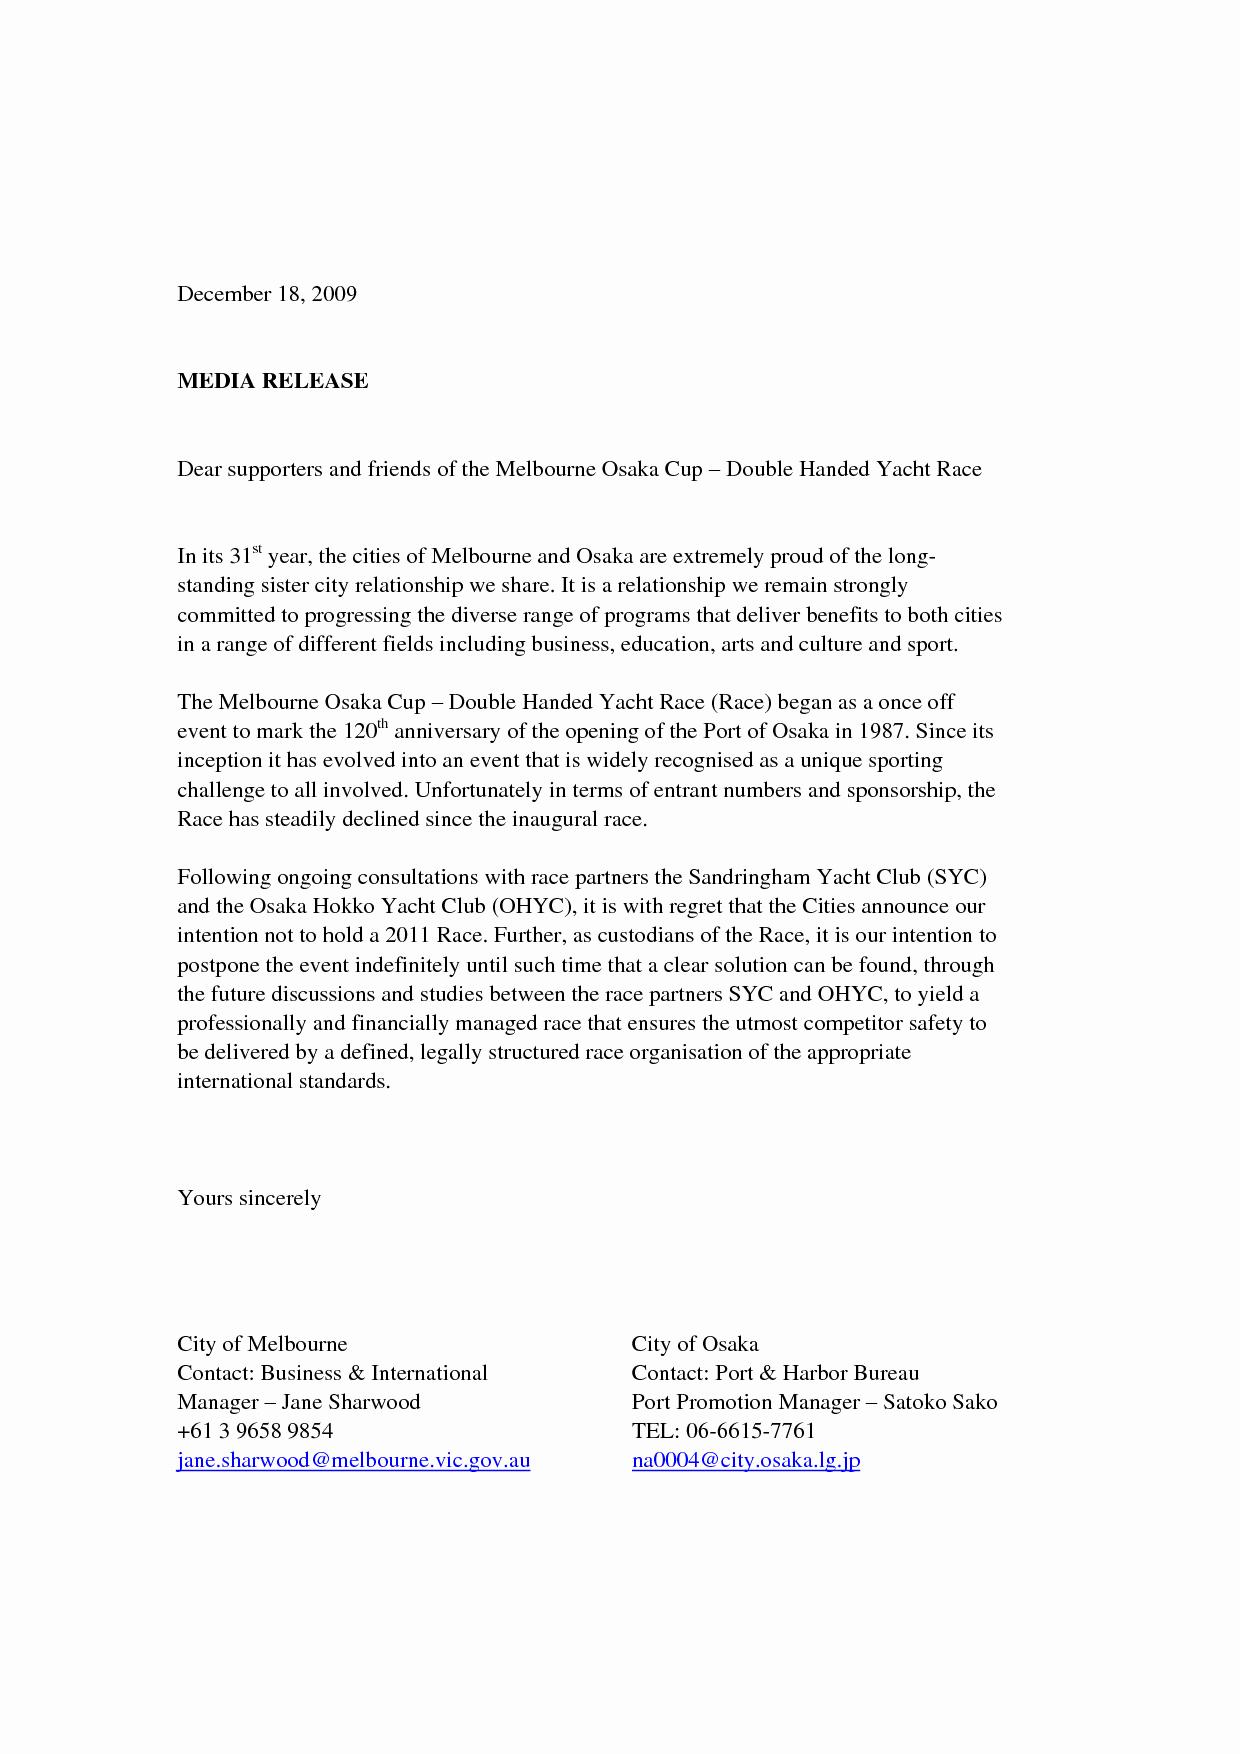 Standard Business Letter format Template Inspirational Interoffice Memorandum Template Tax Invoice Simple Lease